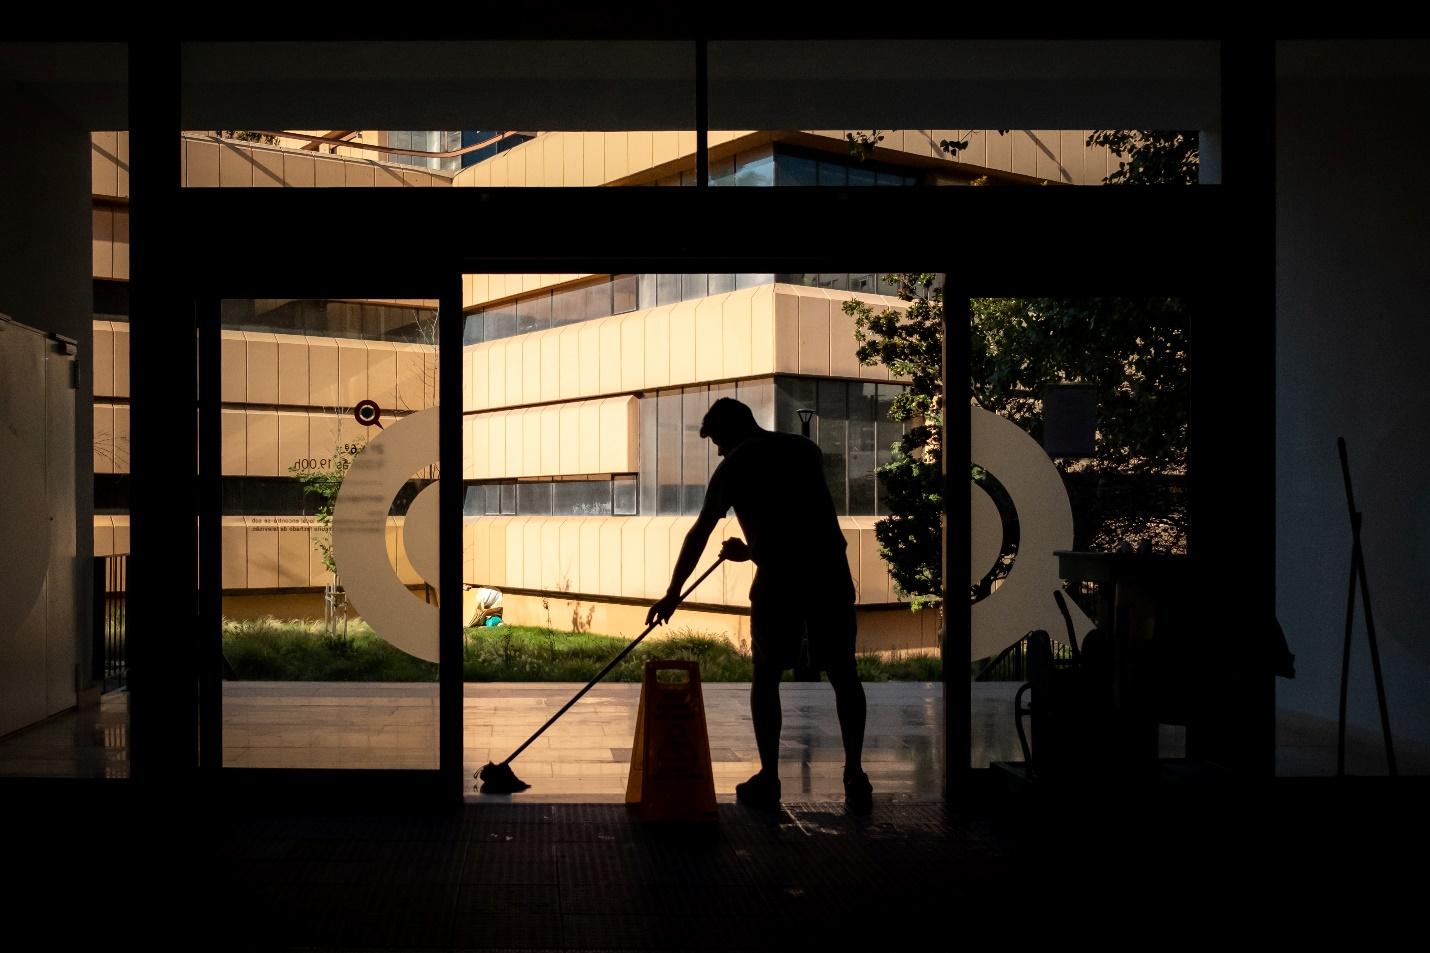 Man cleans entrance of a building